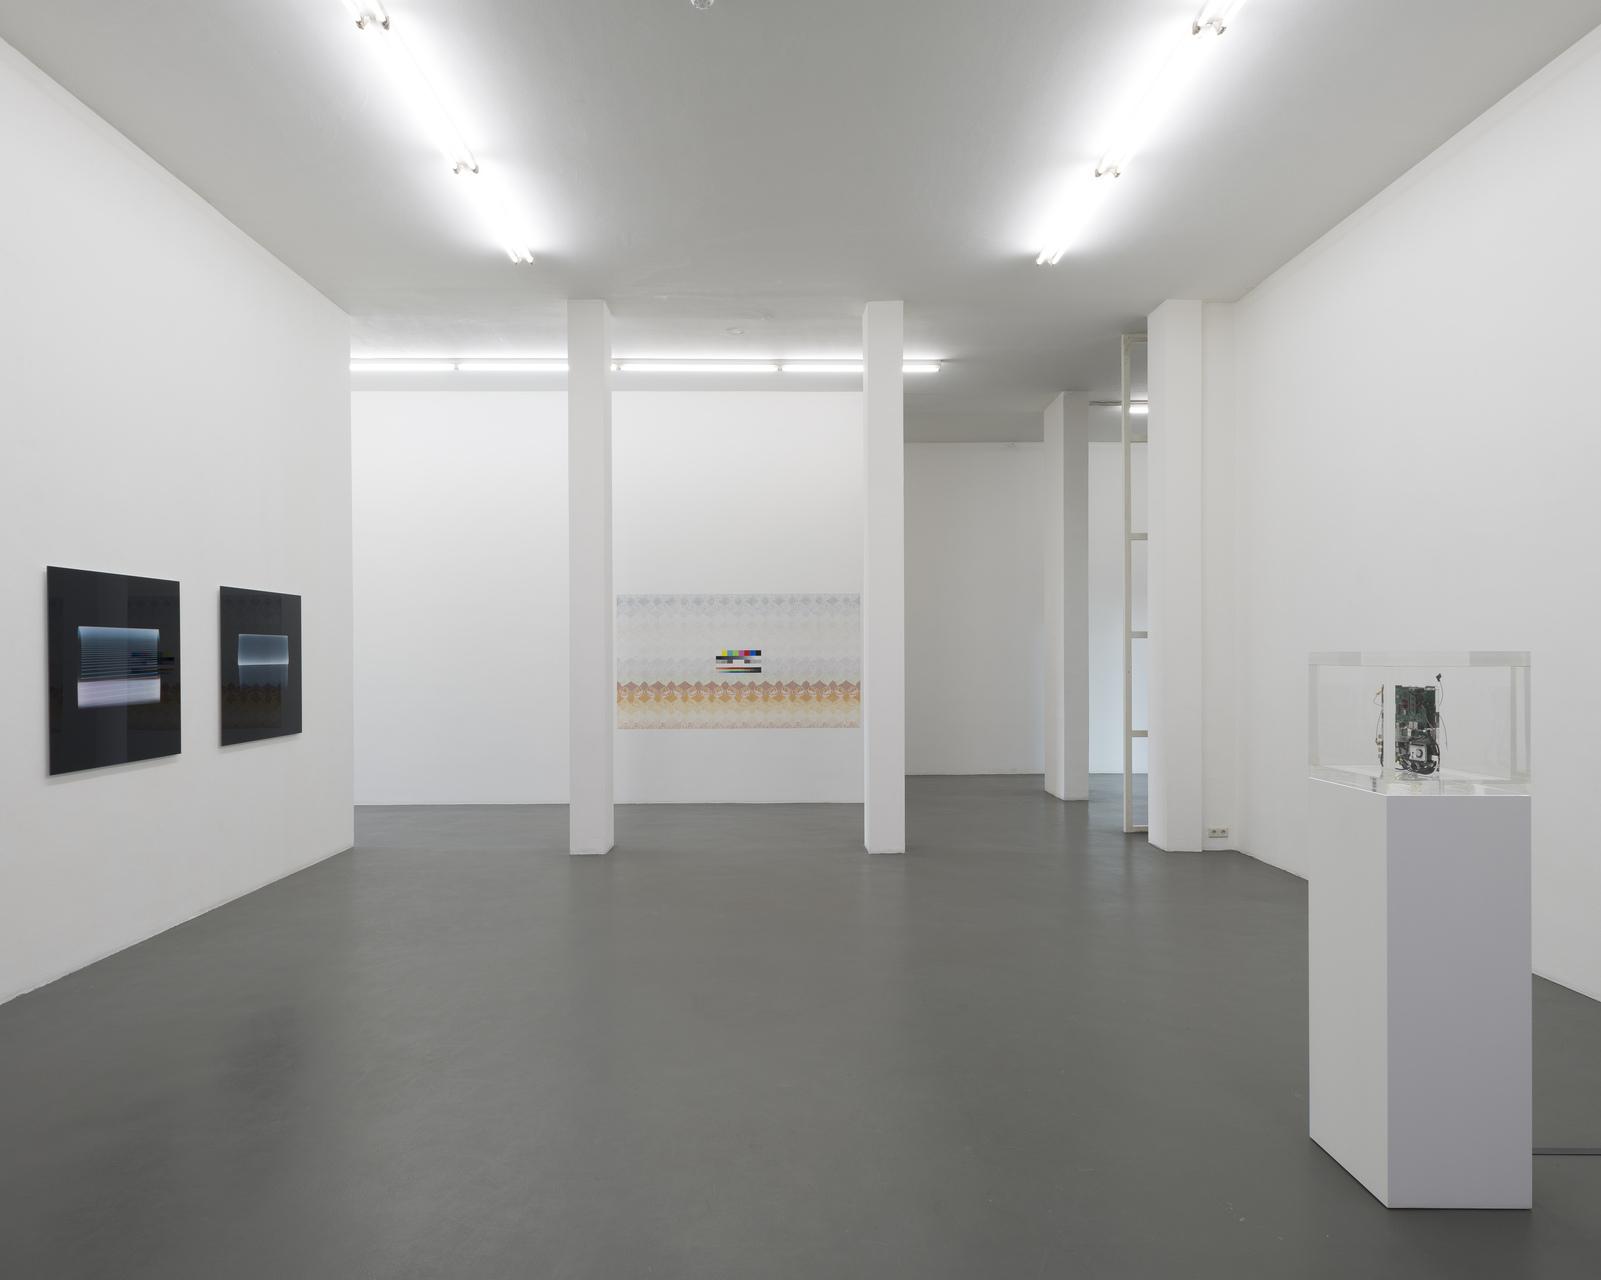 22_Installation view, Navine G. Khan-Dossos, Stephan Tillmans, Trevor Paglen, Jacob Appelbaum